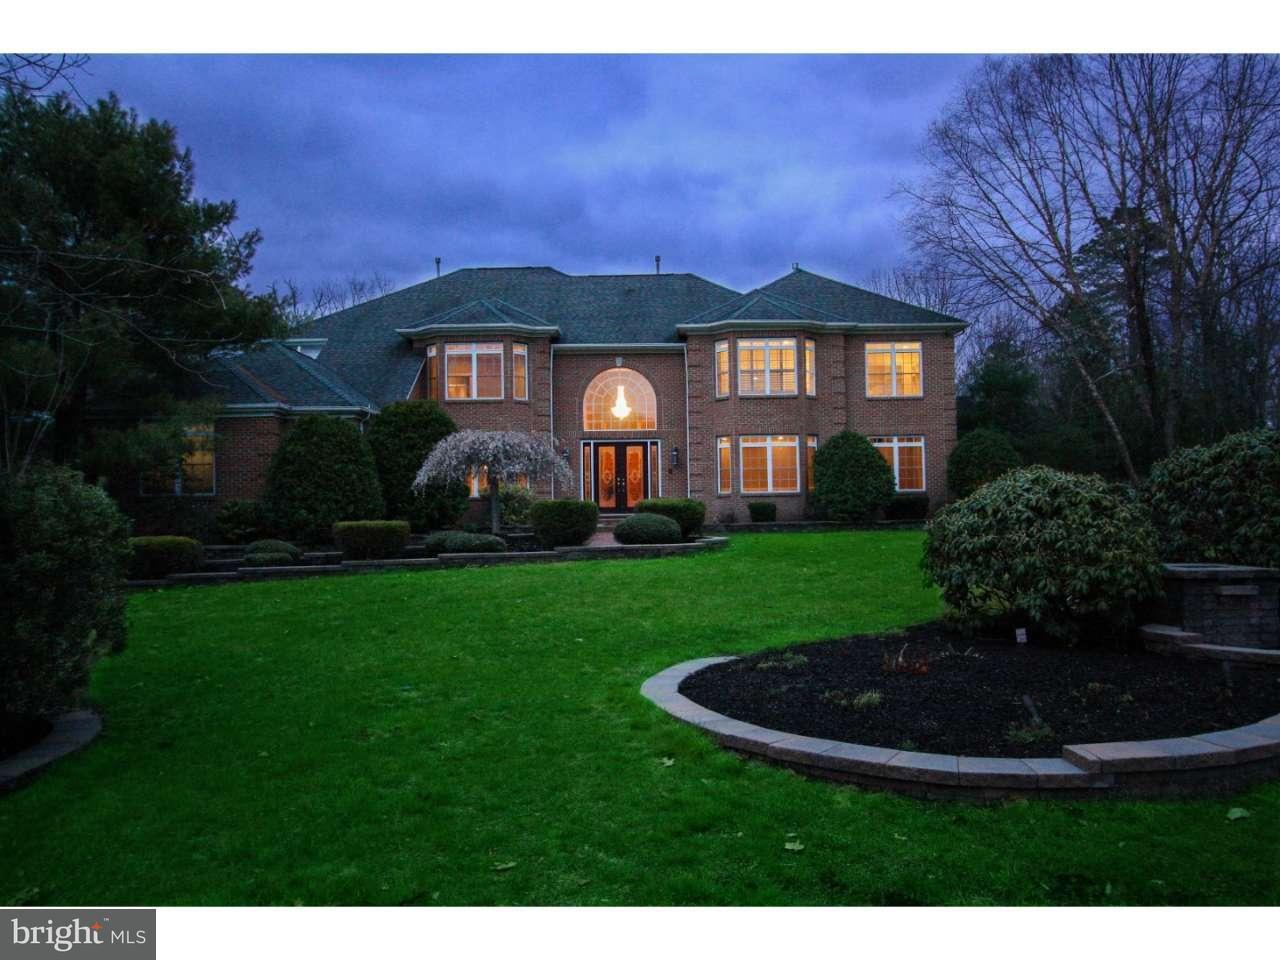 Additional photo for property listing at 6 JASPER JOHNS WAY  Evesham, New Jersey 08053 États-Unis